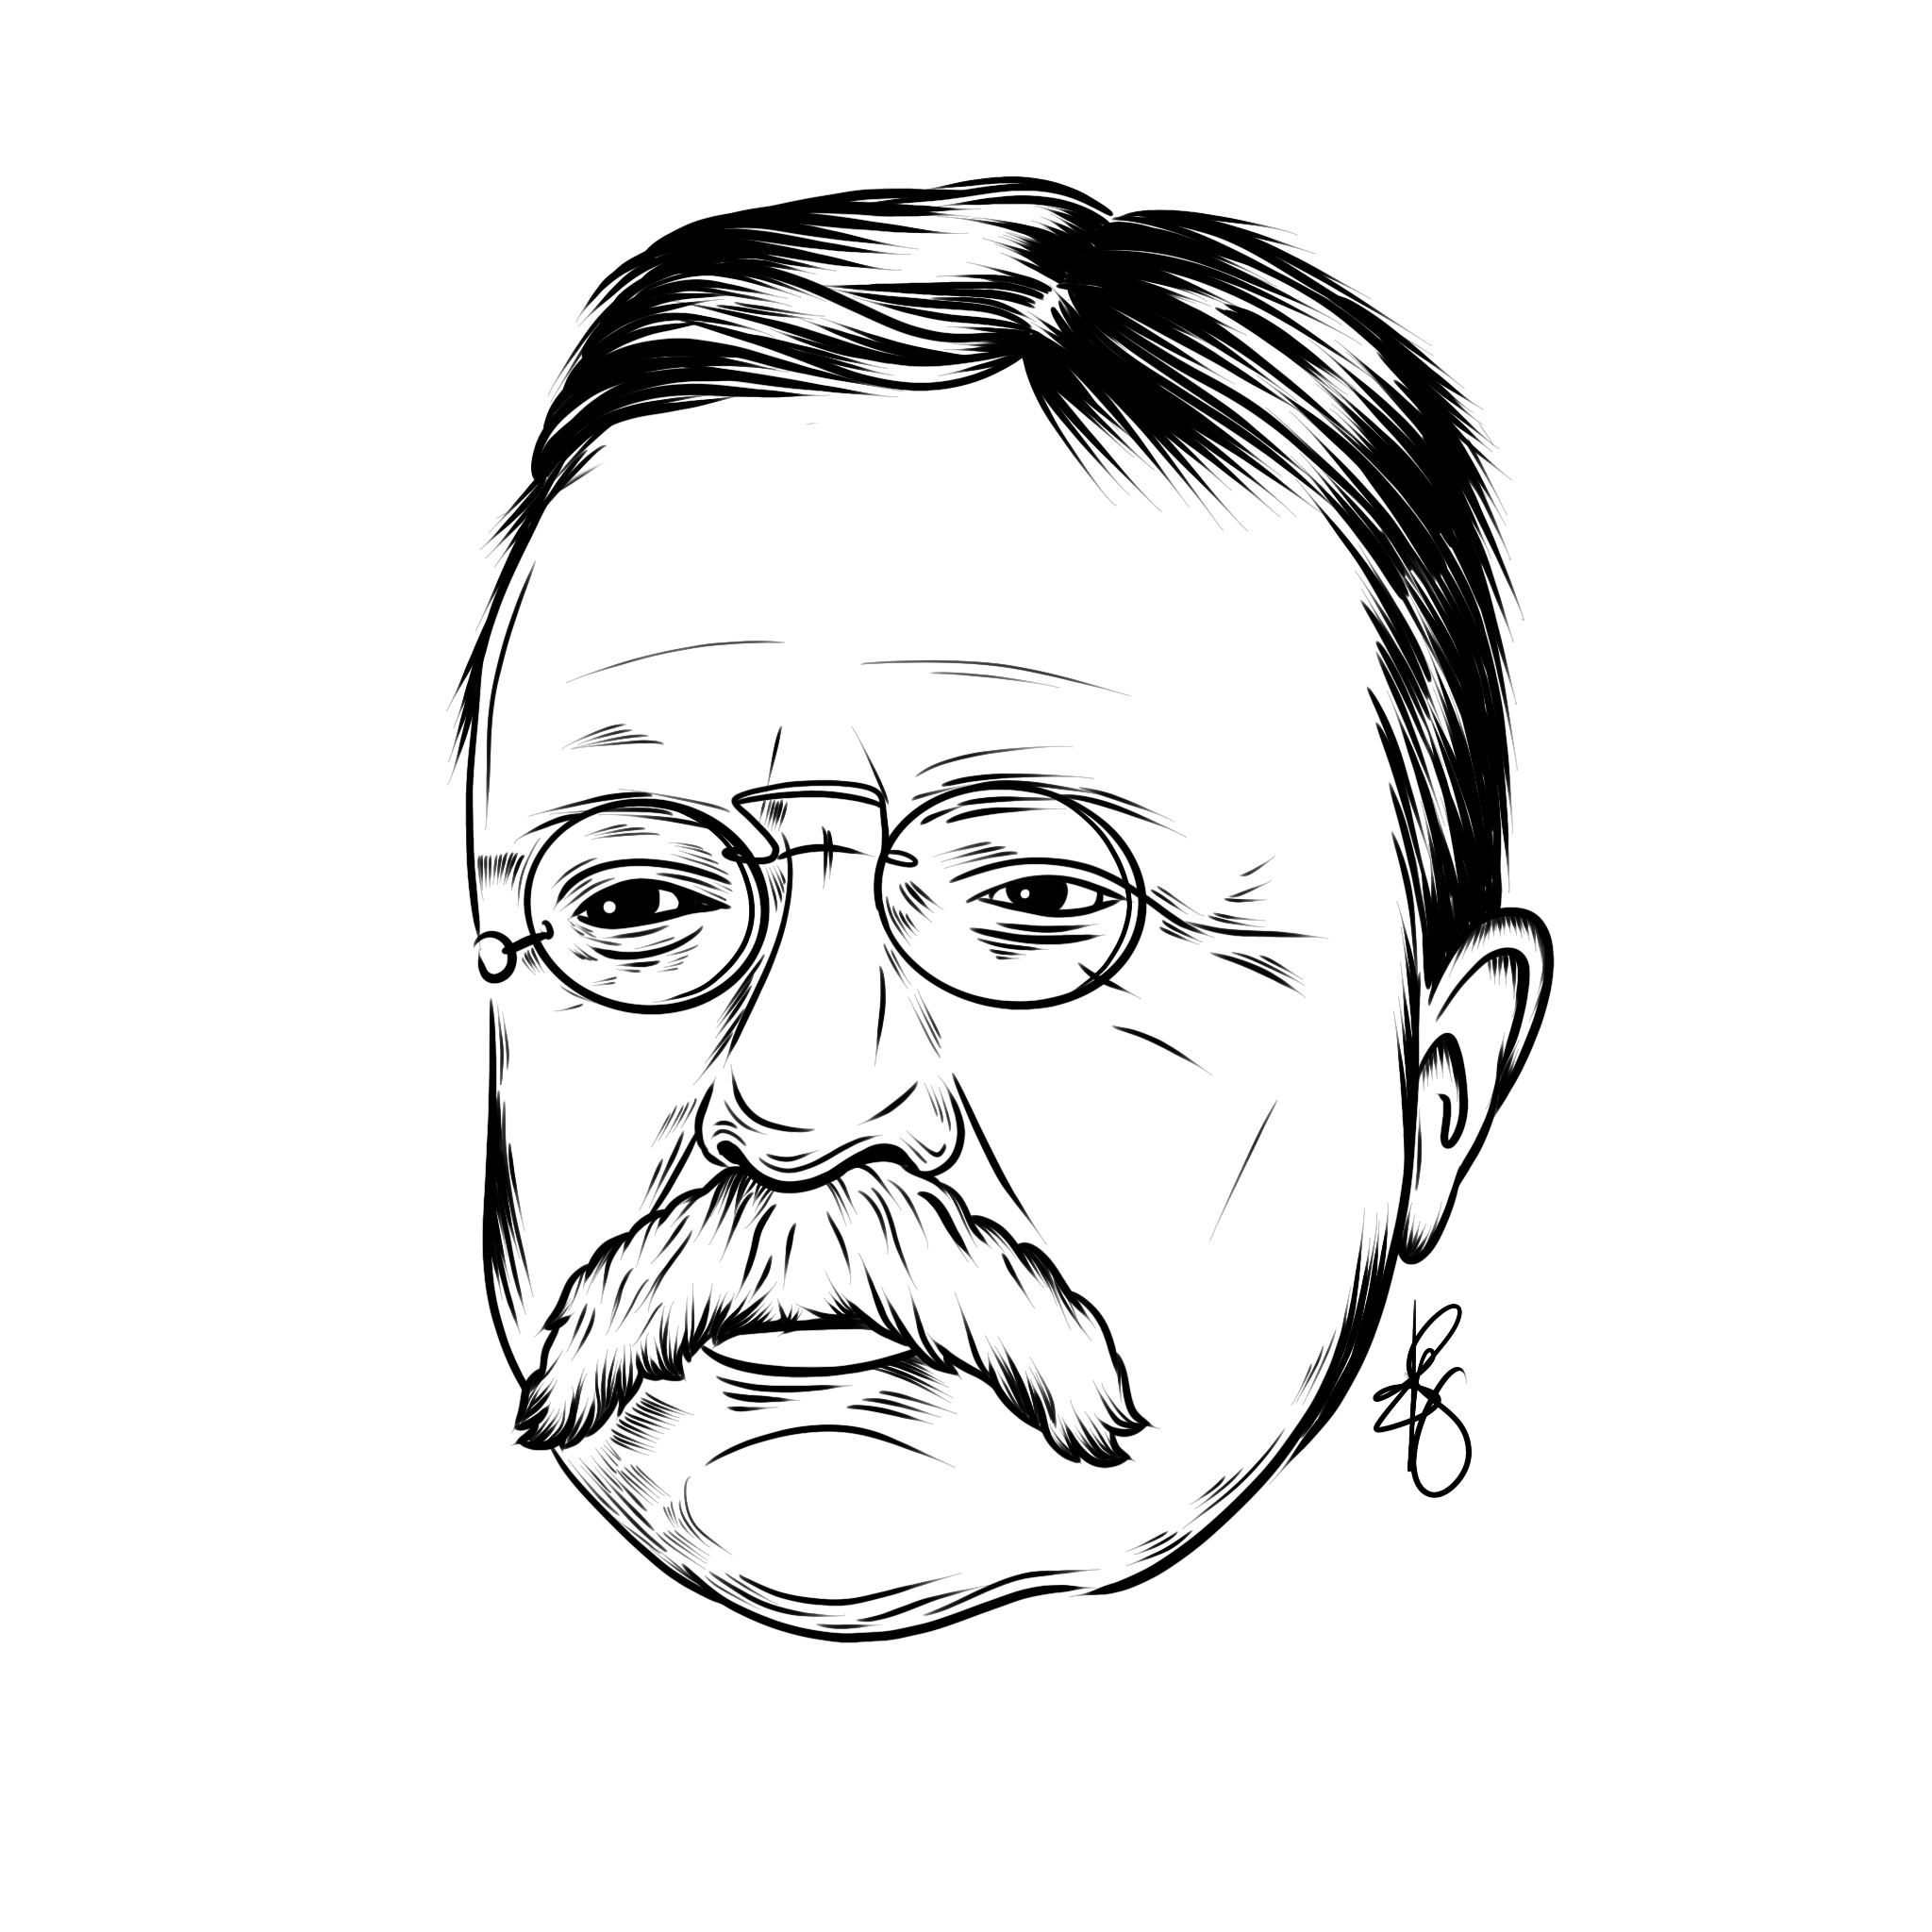 Theodore Roosevelt President Portrait Instagram Instagram Photo Photo And Video